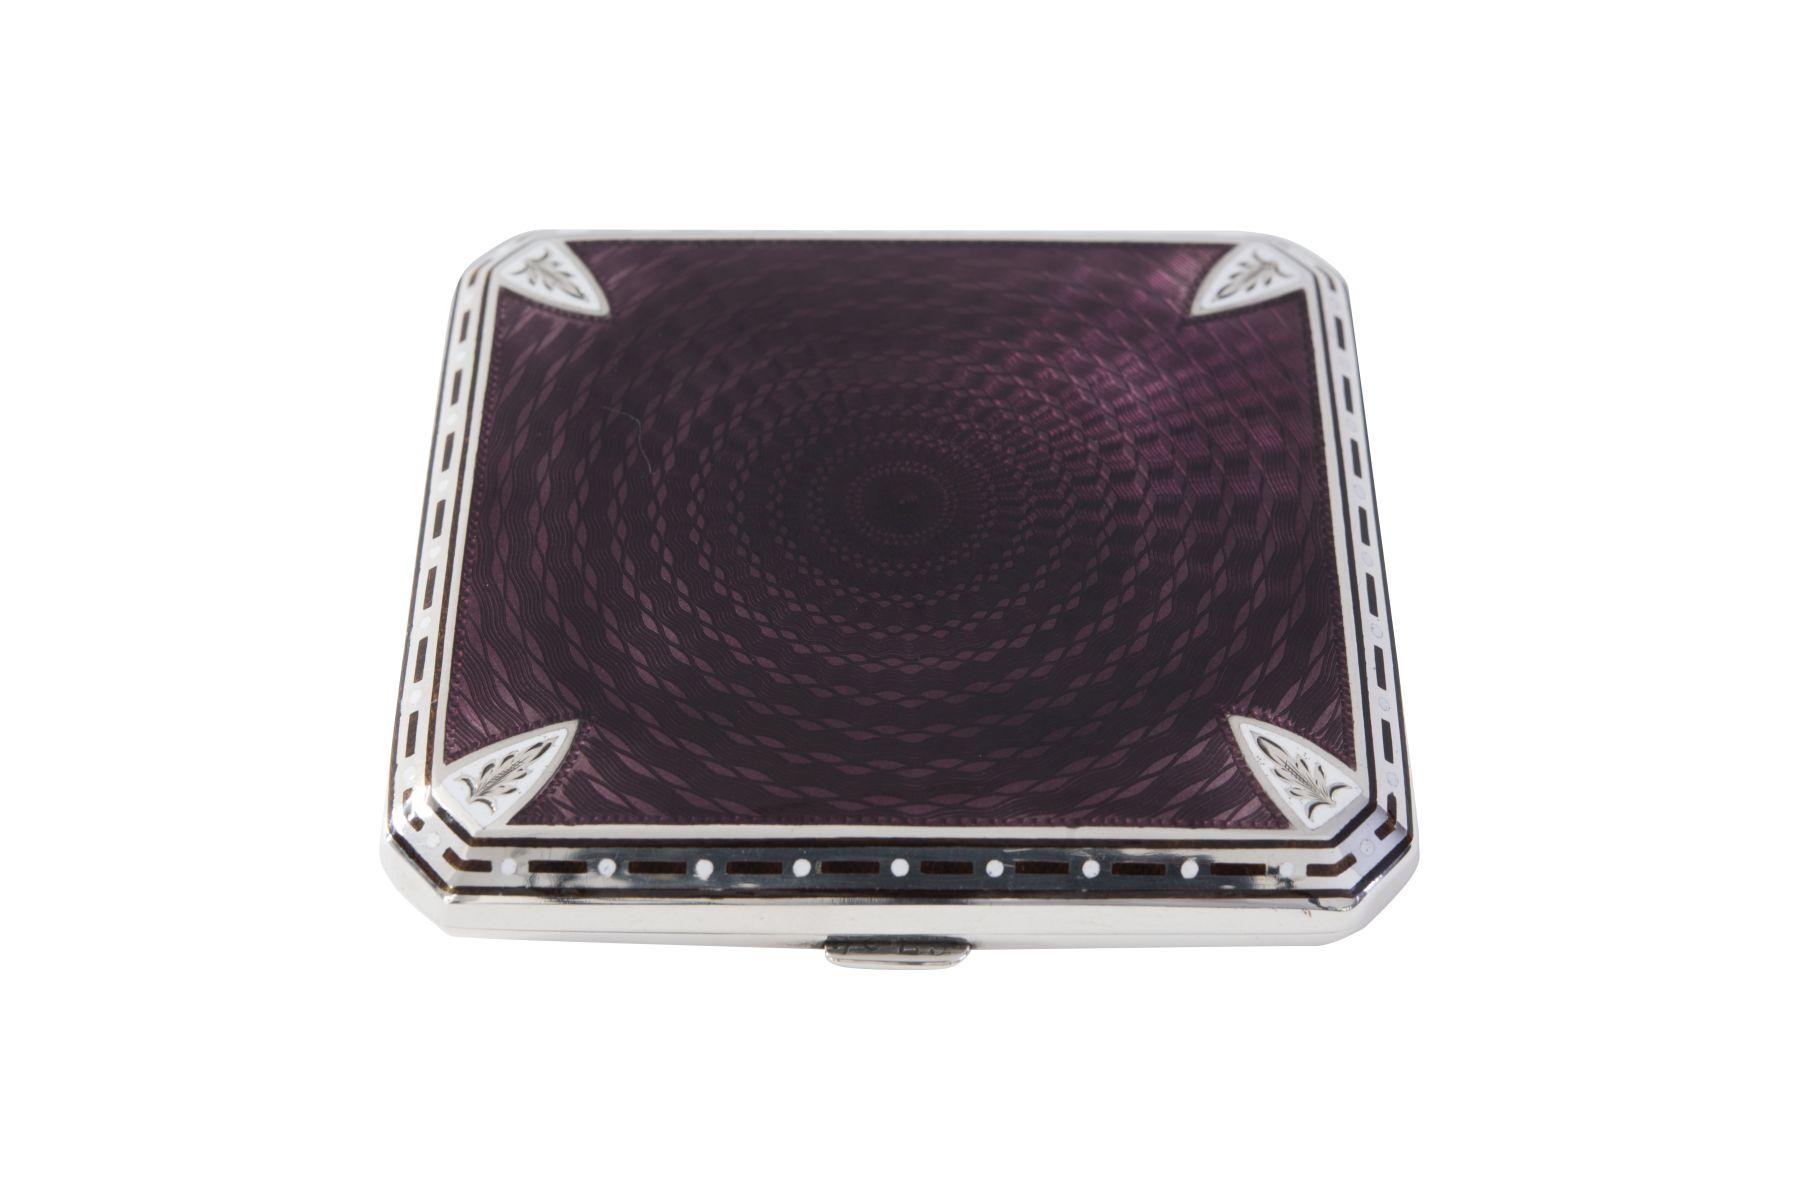 #107 Spring lid silver box | Sprungdeckel Silberdose Image